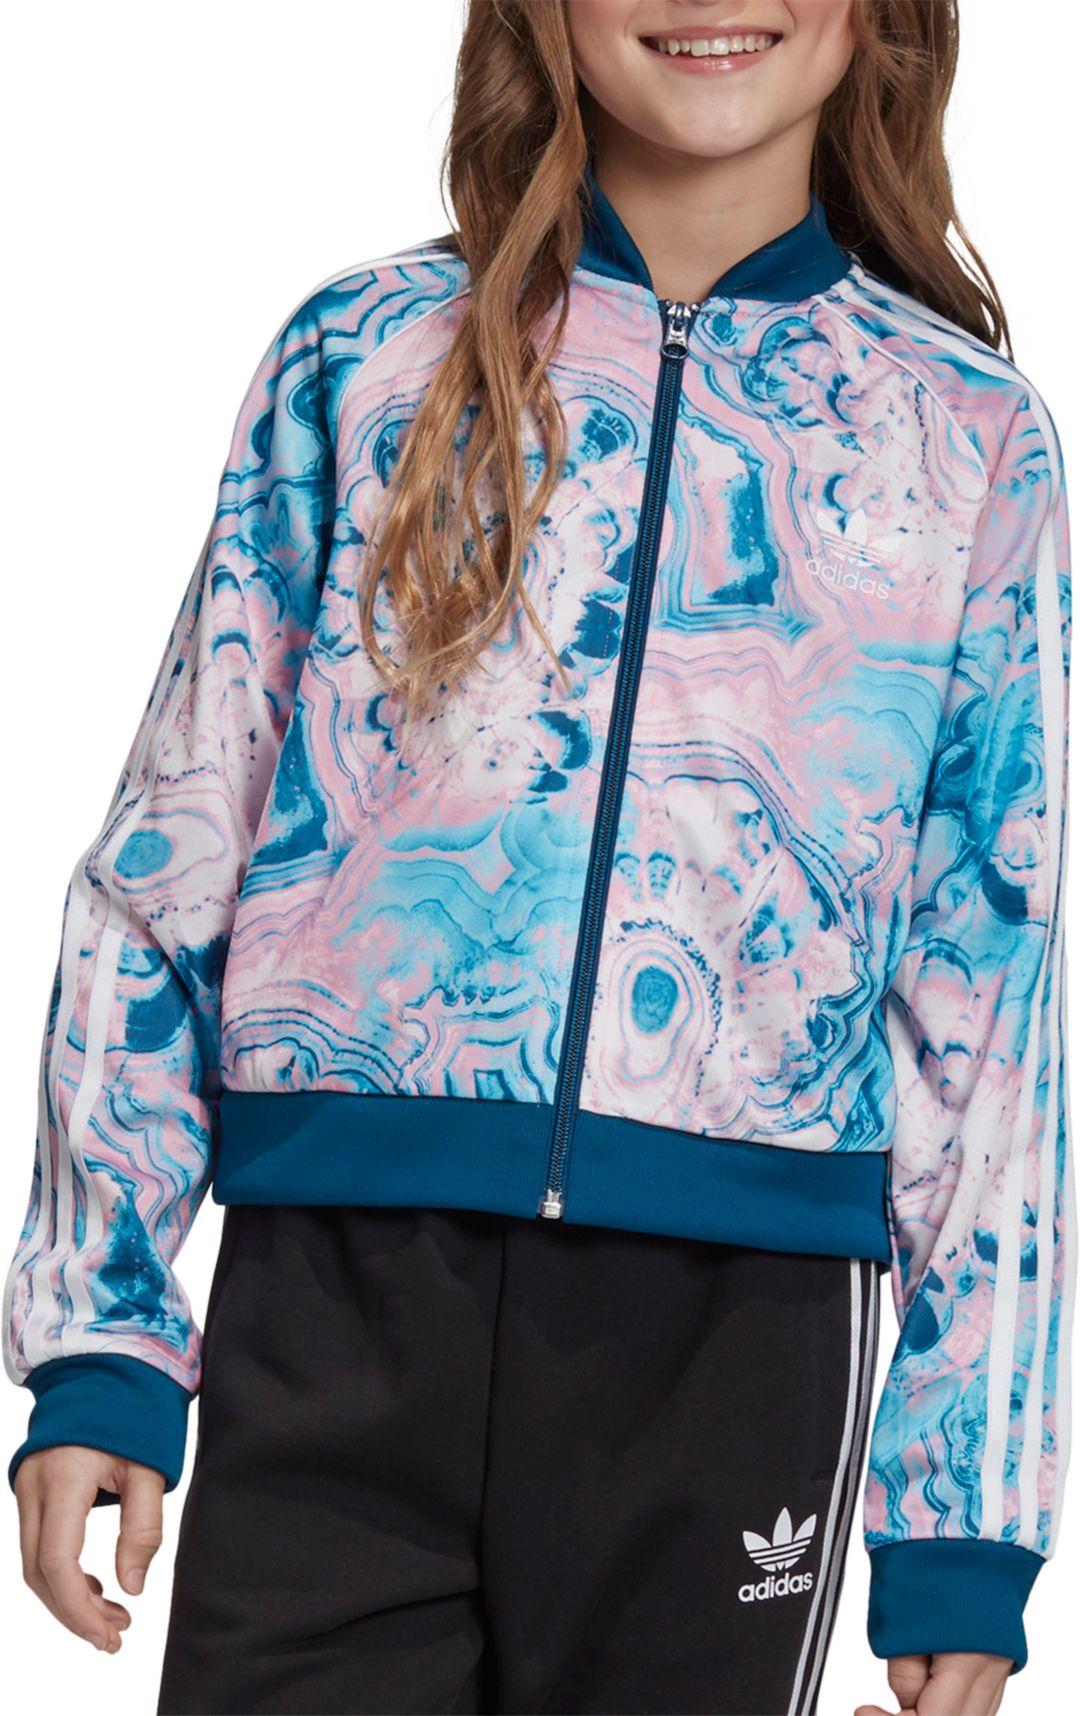 adidas Originals Girls' Marble Cropped Superstar Track Jacket